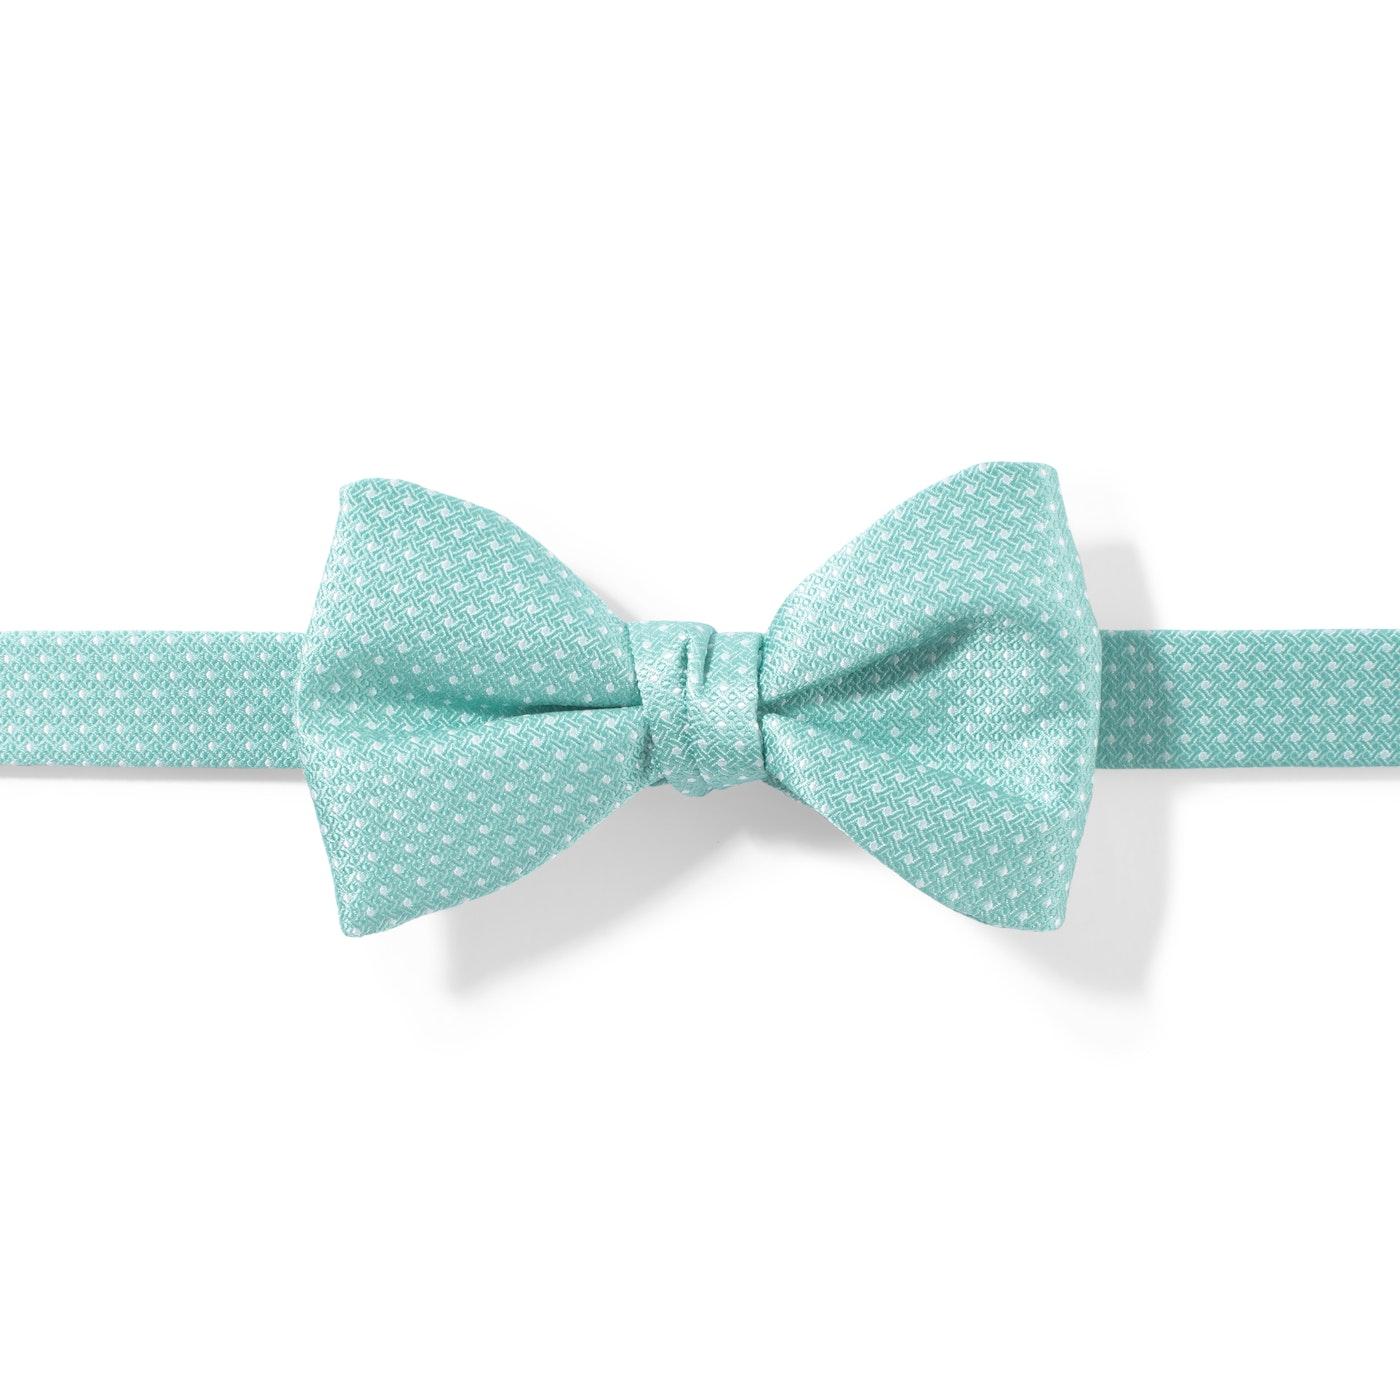 29f3c304e66 Tiffany Blue and White Pin Dot Pre-Tied Bow Tie